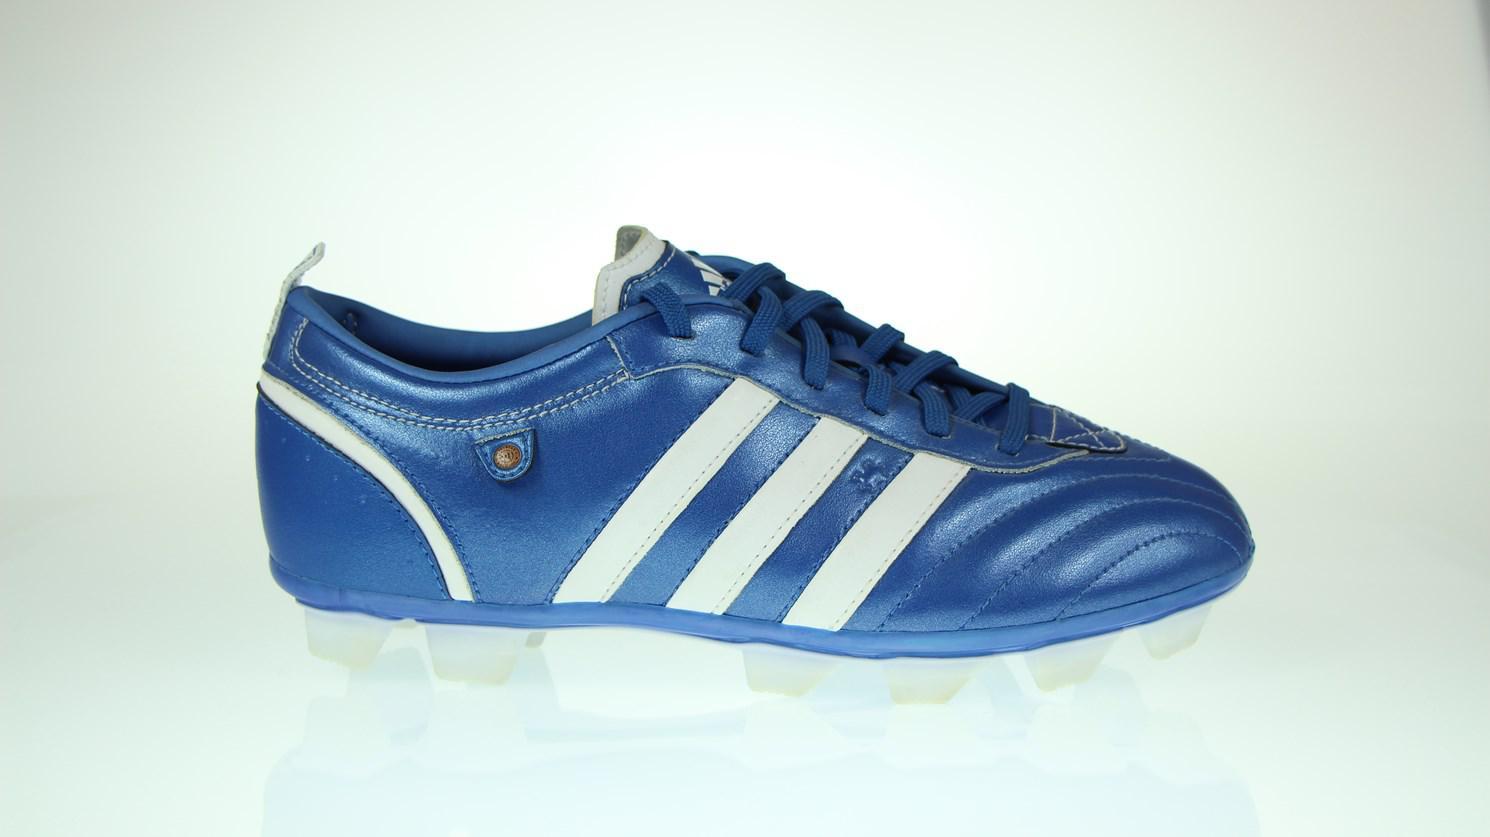 Buty piłkarskie Adidas Telstar II FGJ 358894 ambersport.pl